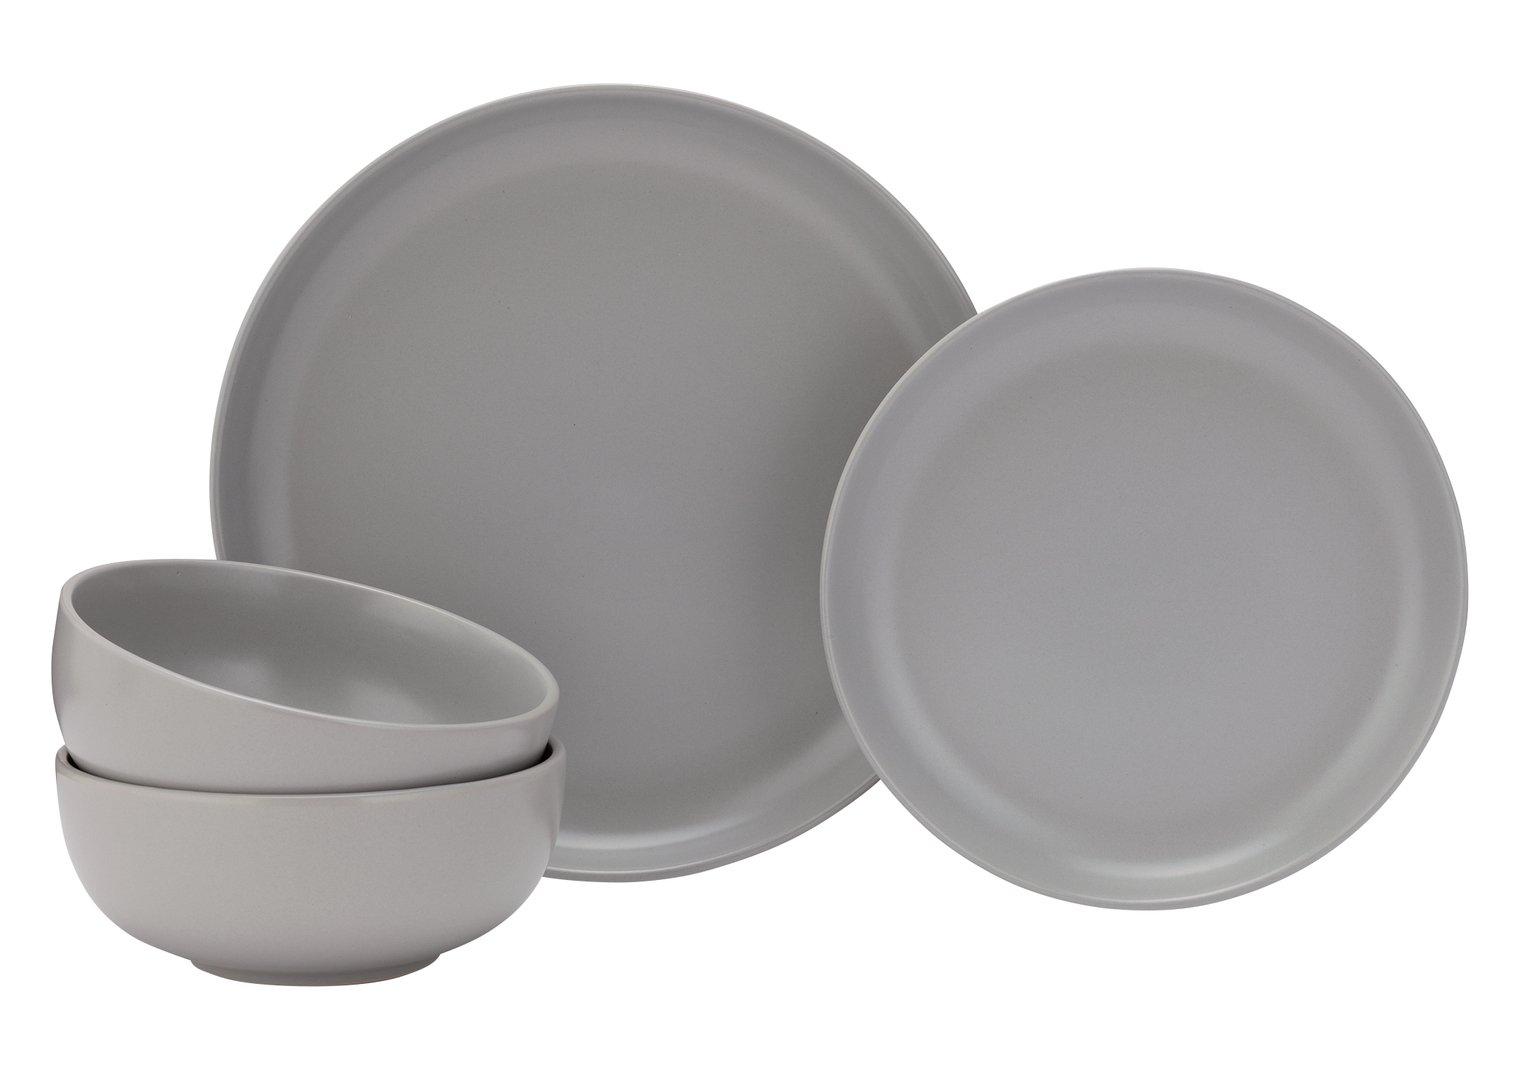 Grey Argos Home Palatial 12 Piece Dishwasher Safe Dinner Set